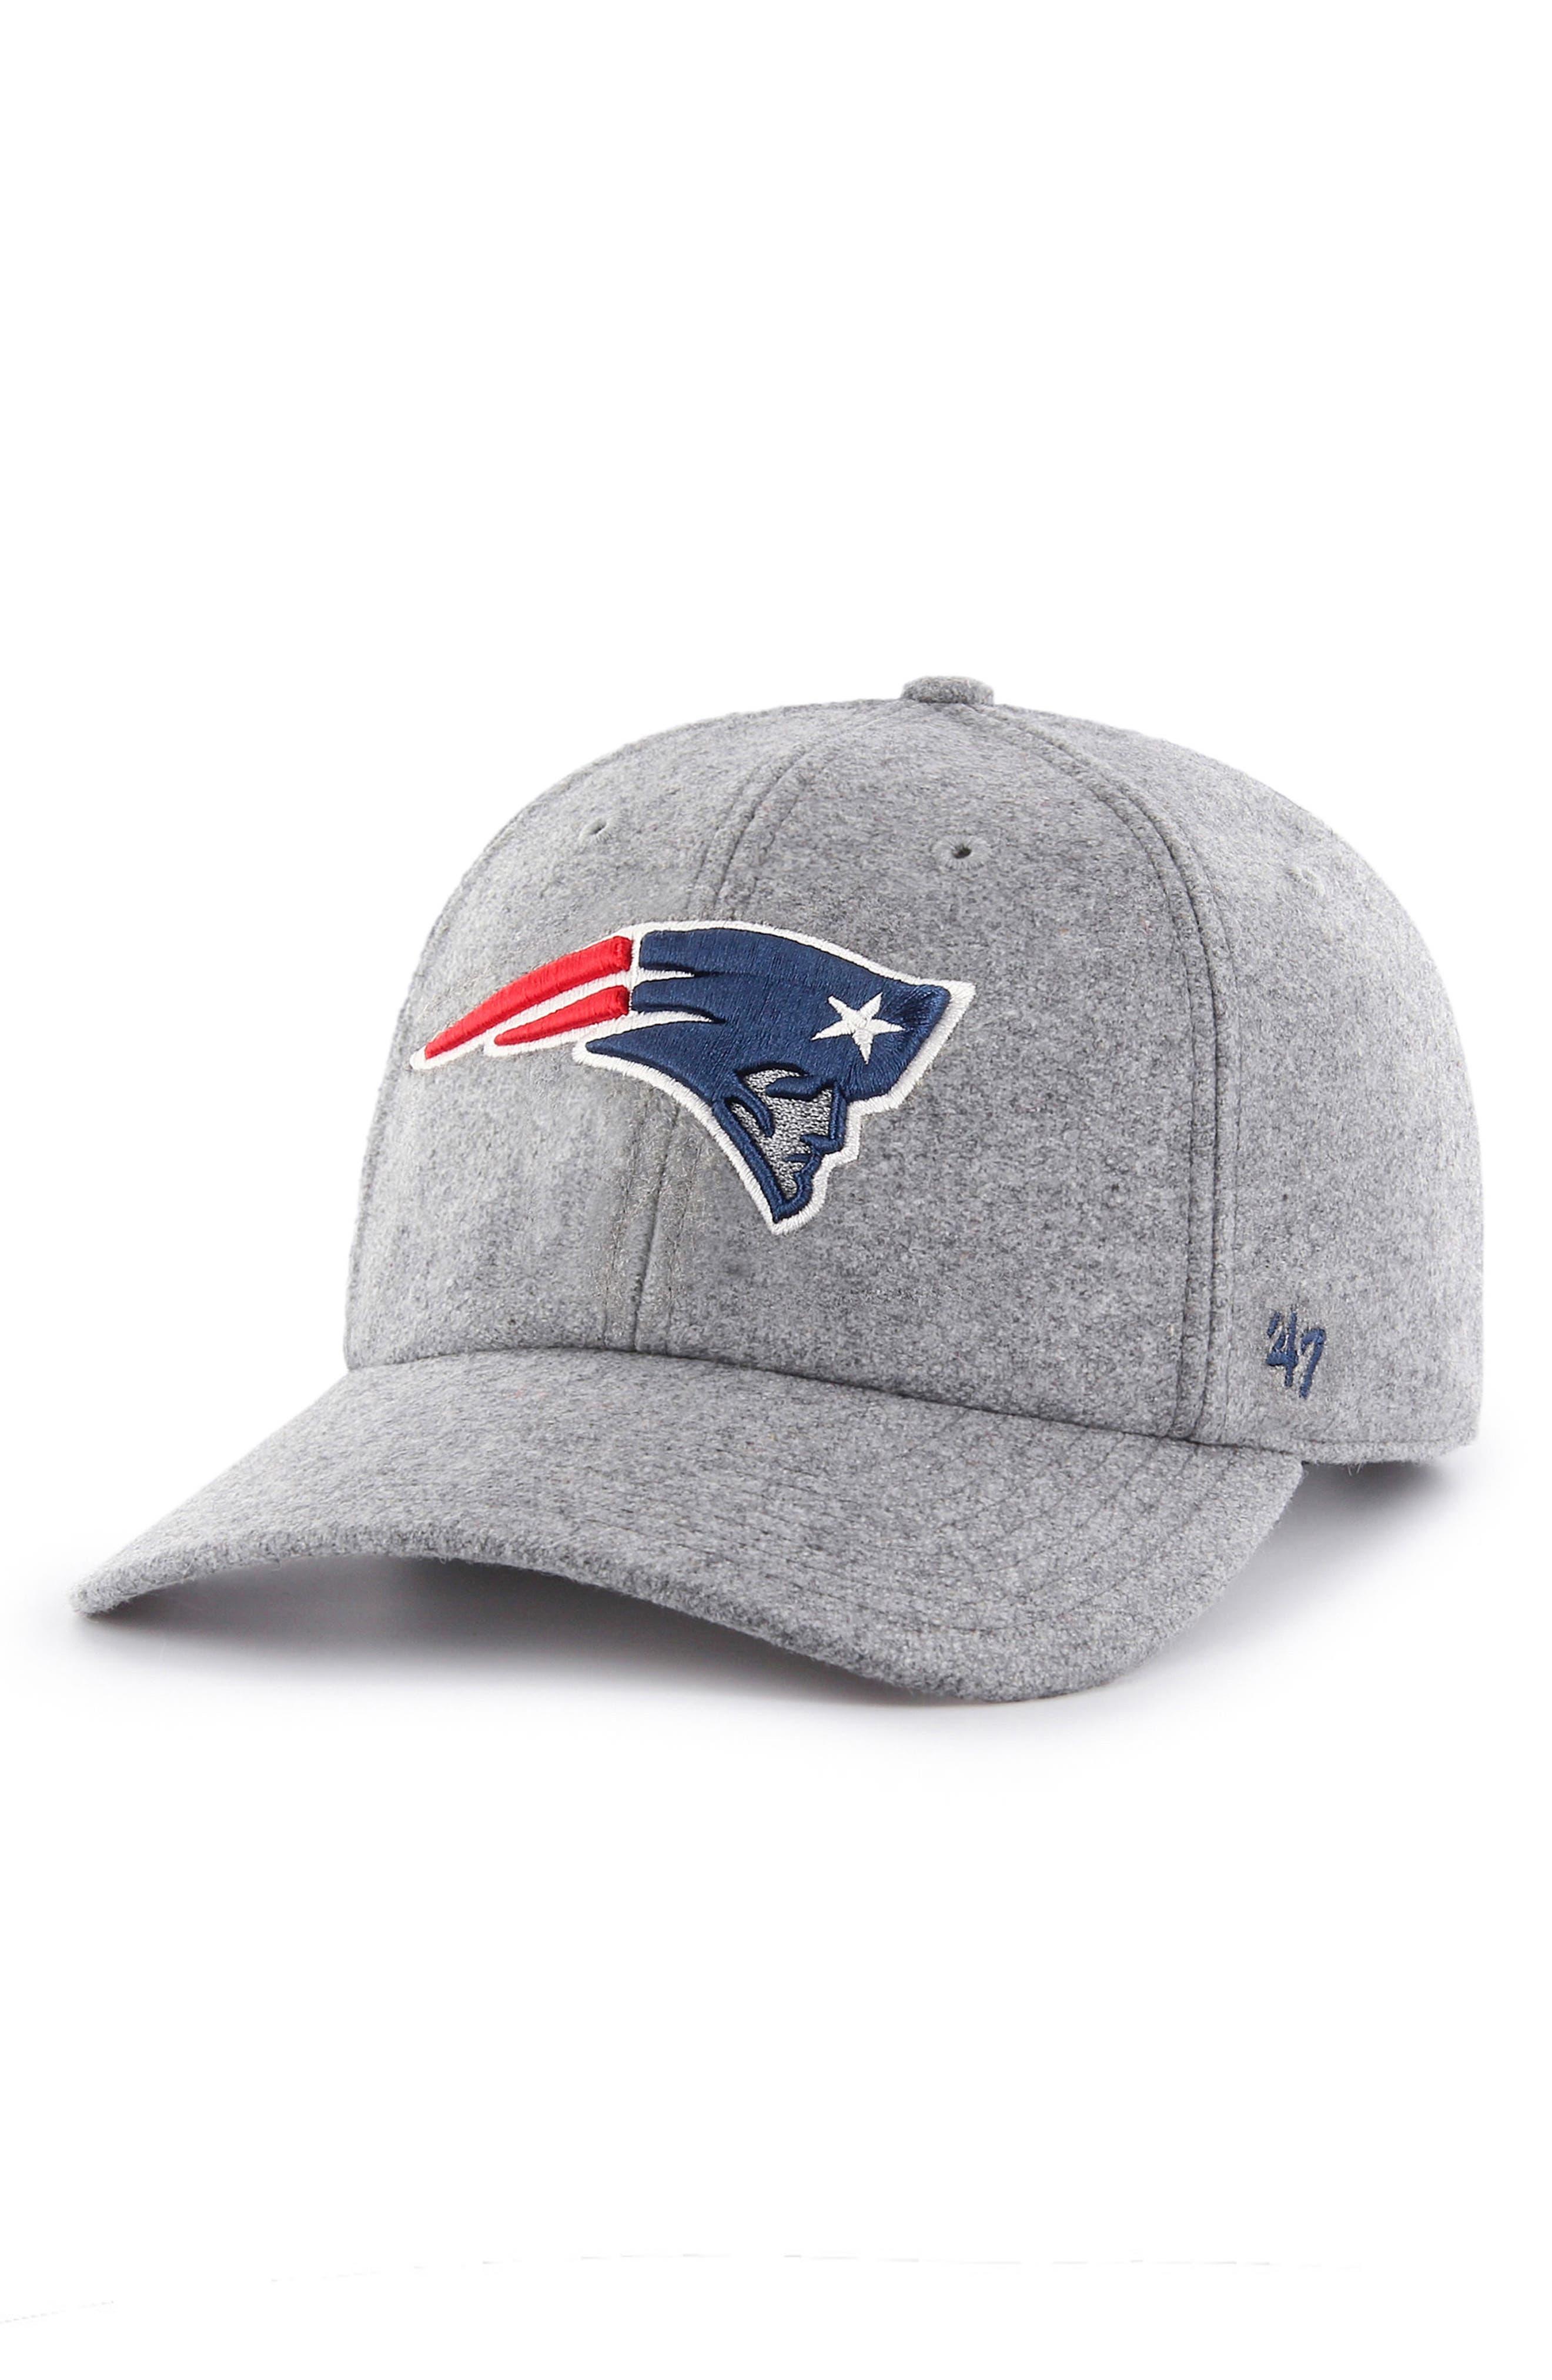 NFL Clean-Up Ball Cap,                             Main thumbnail 1, color,                             New England Patriots